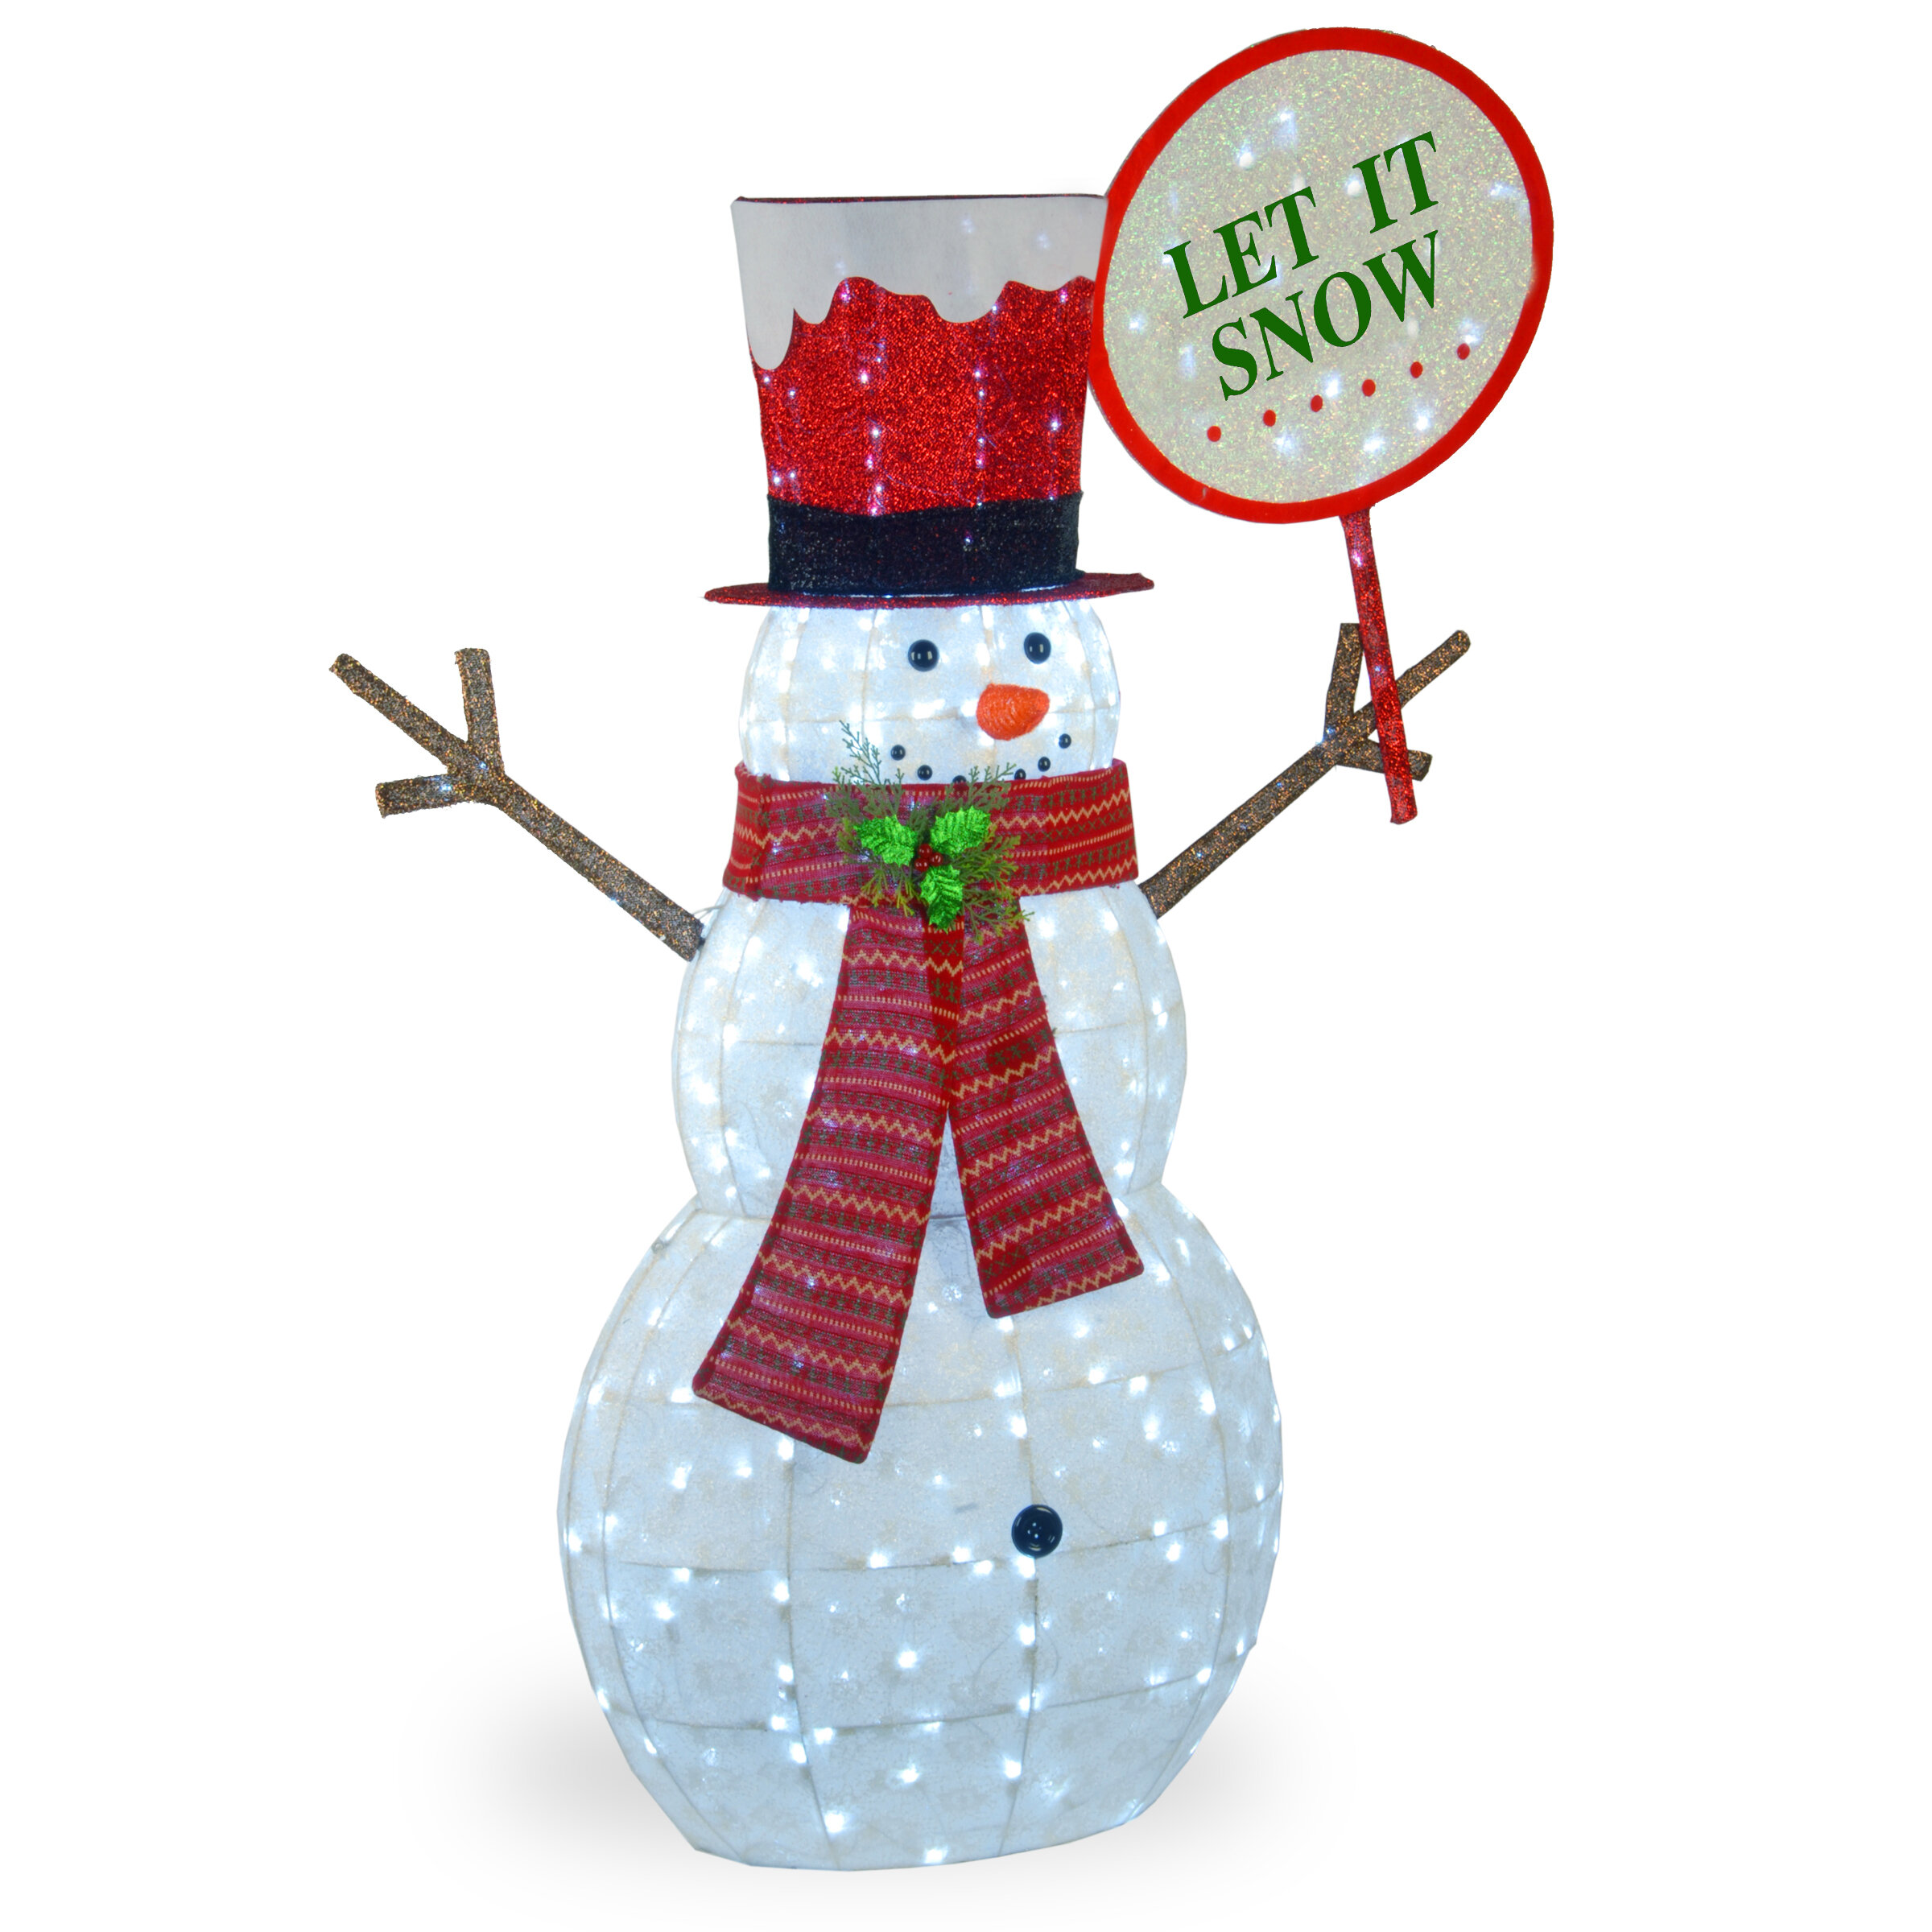 Snowman Decoration Lighted Display